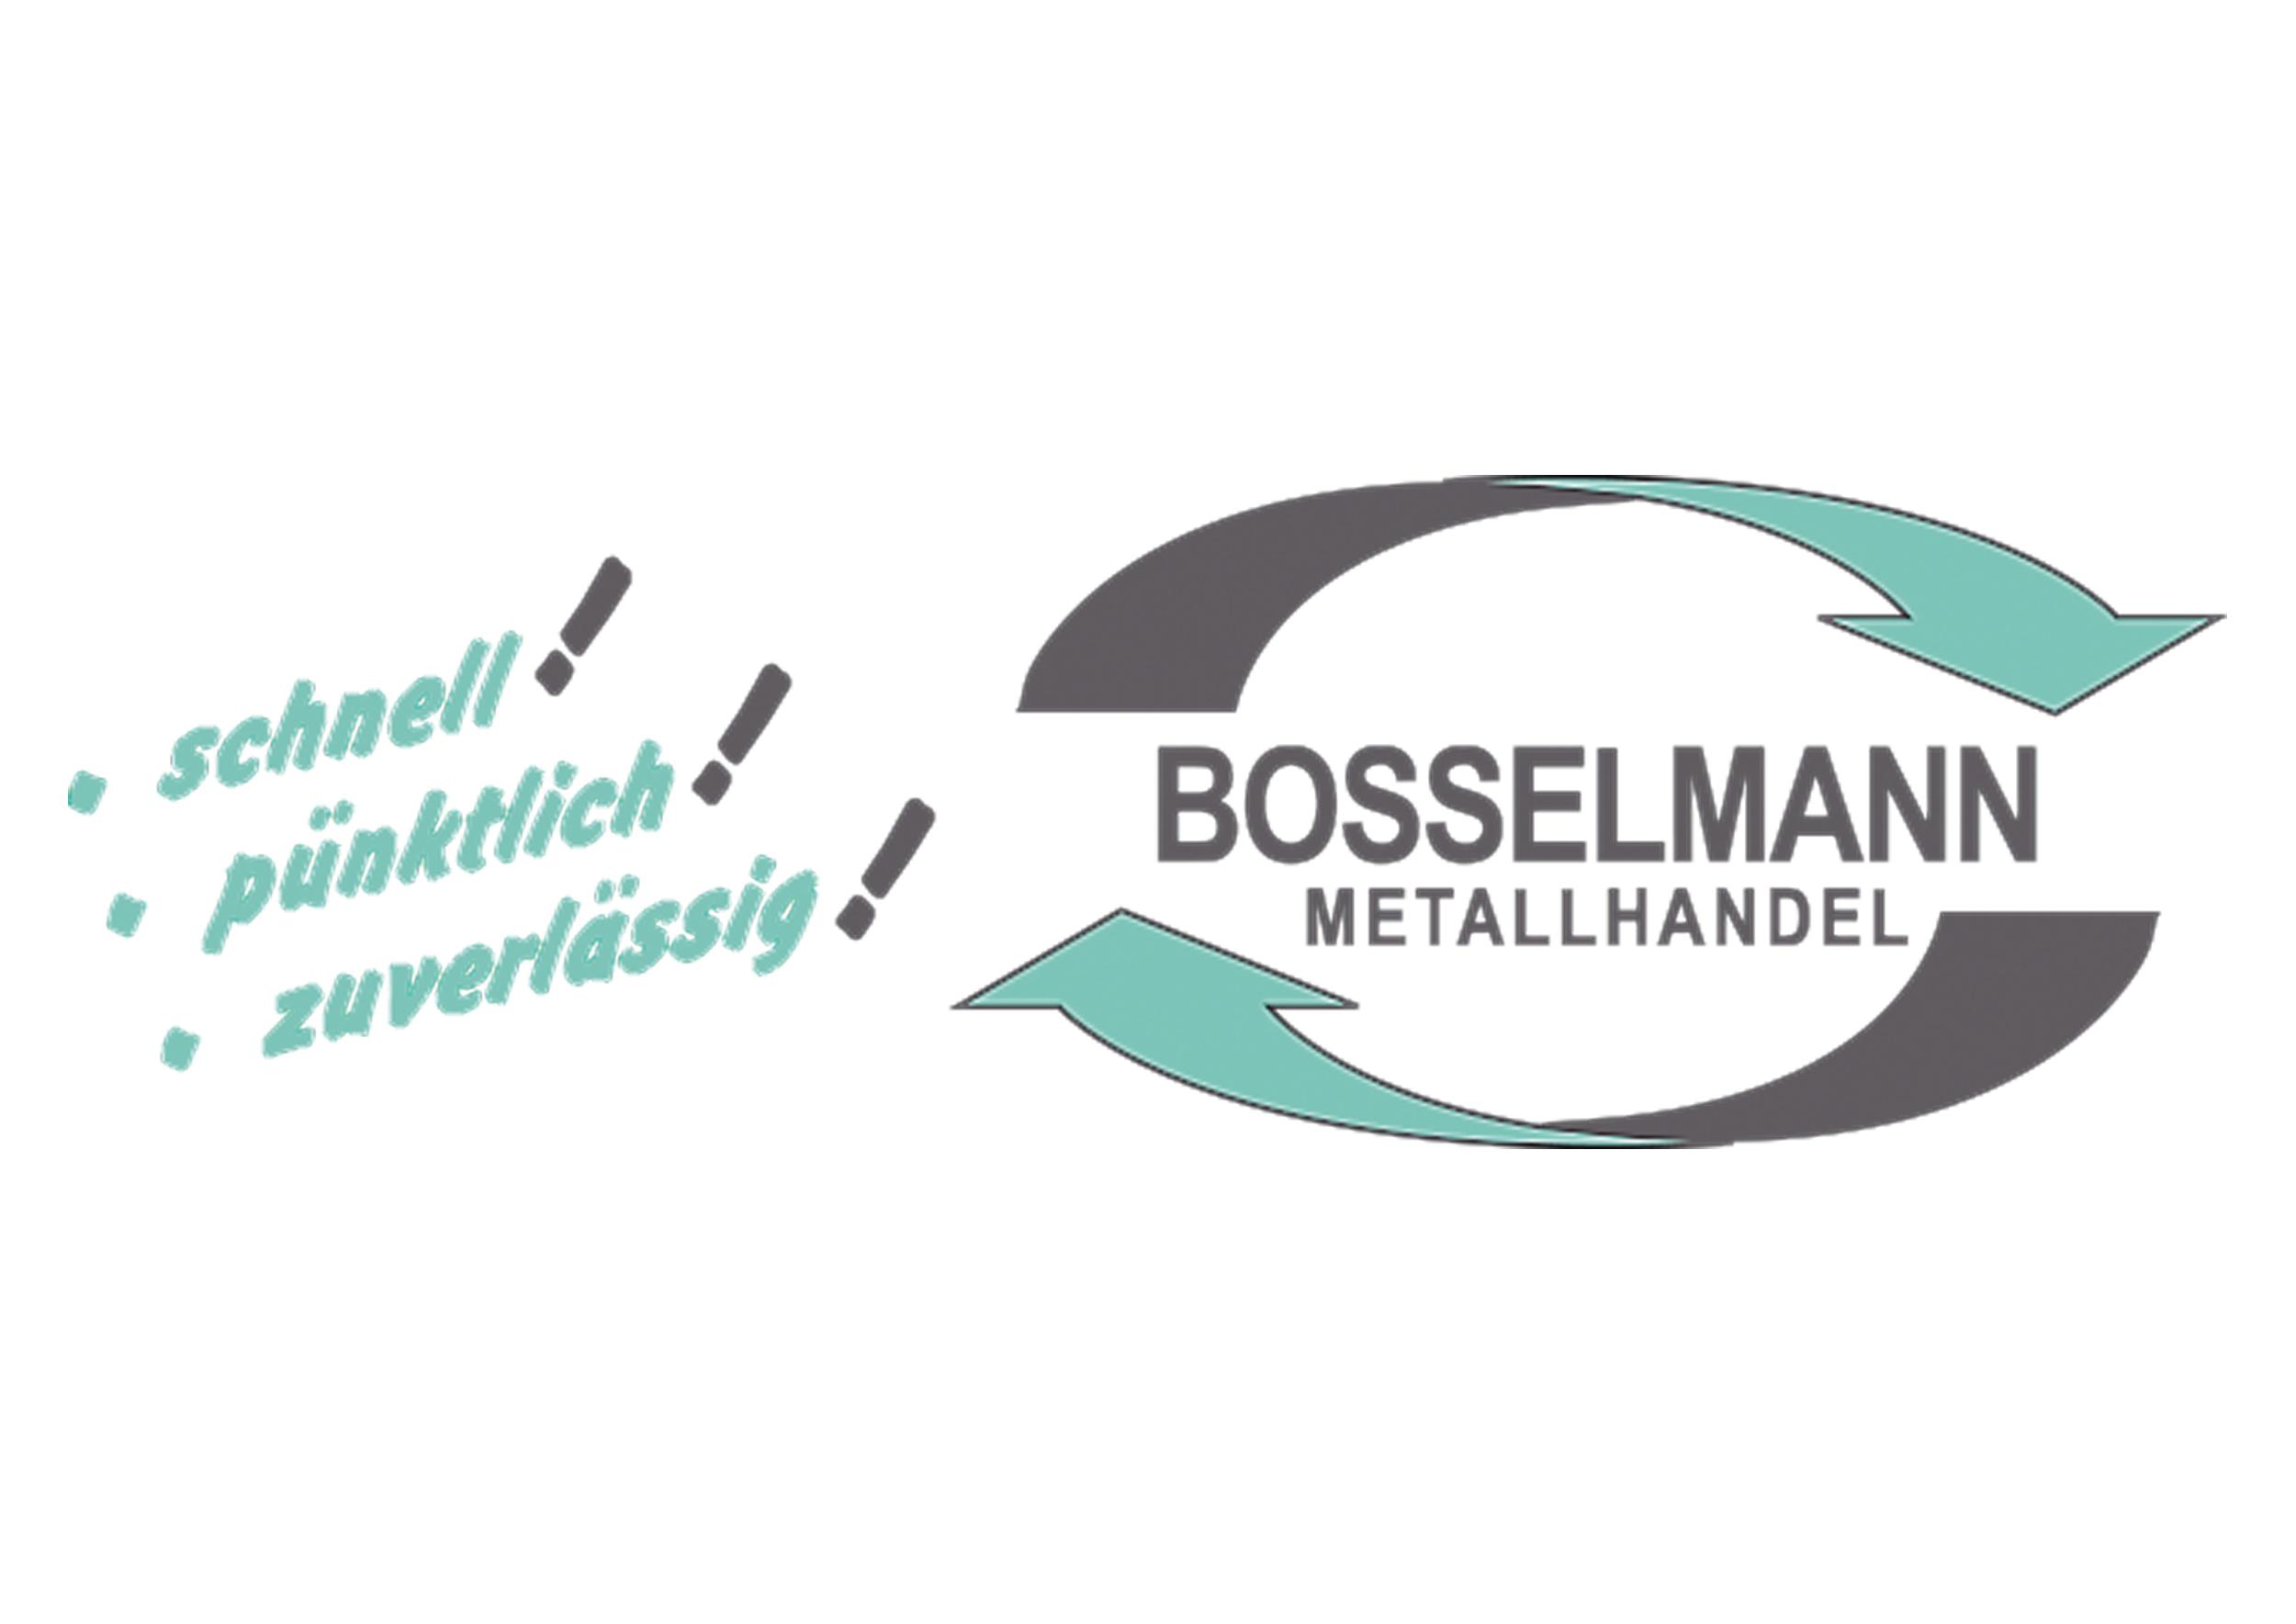 bzb_web_bosselmann_metallhandel_logo_2500x1768.jpg